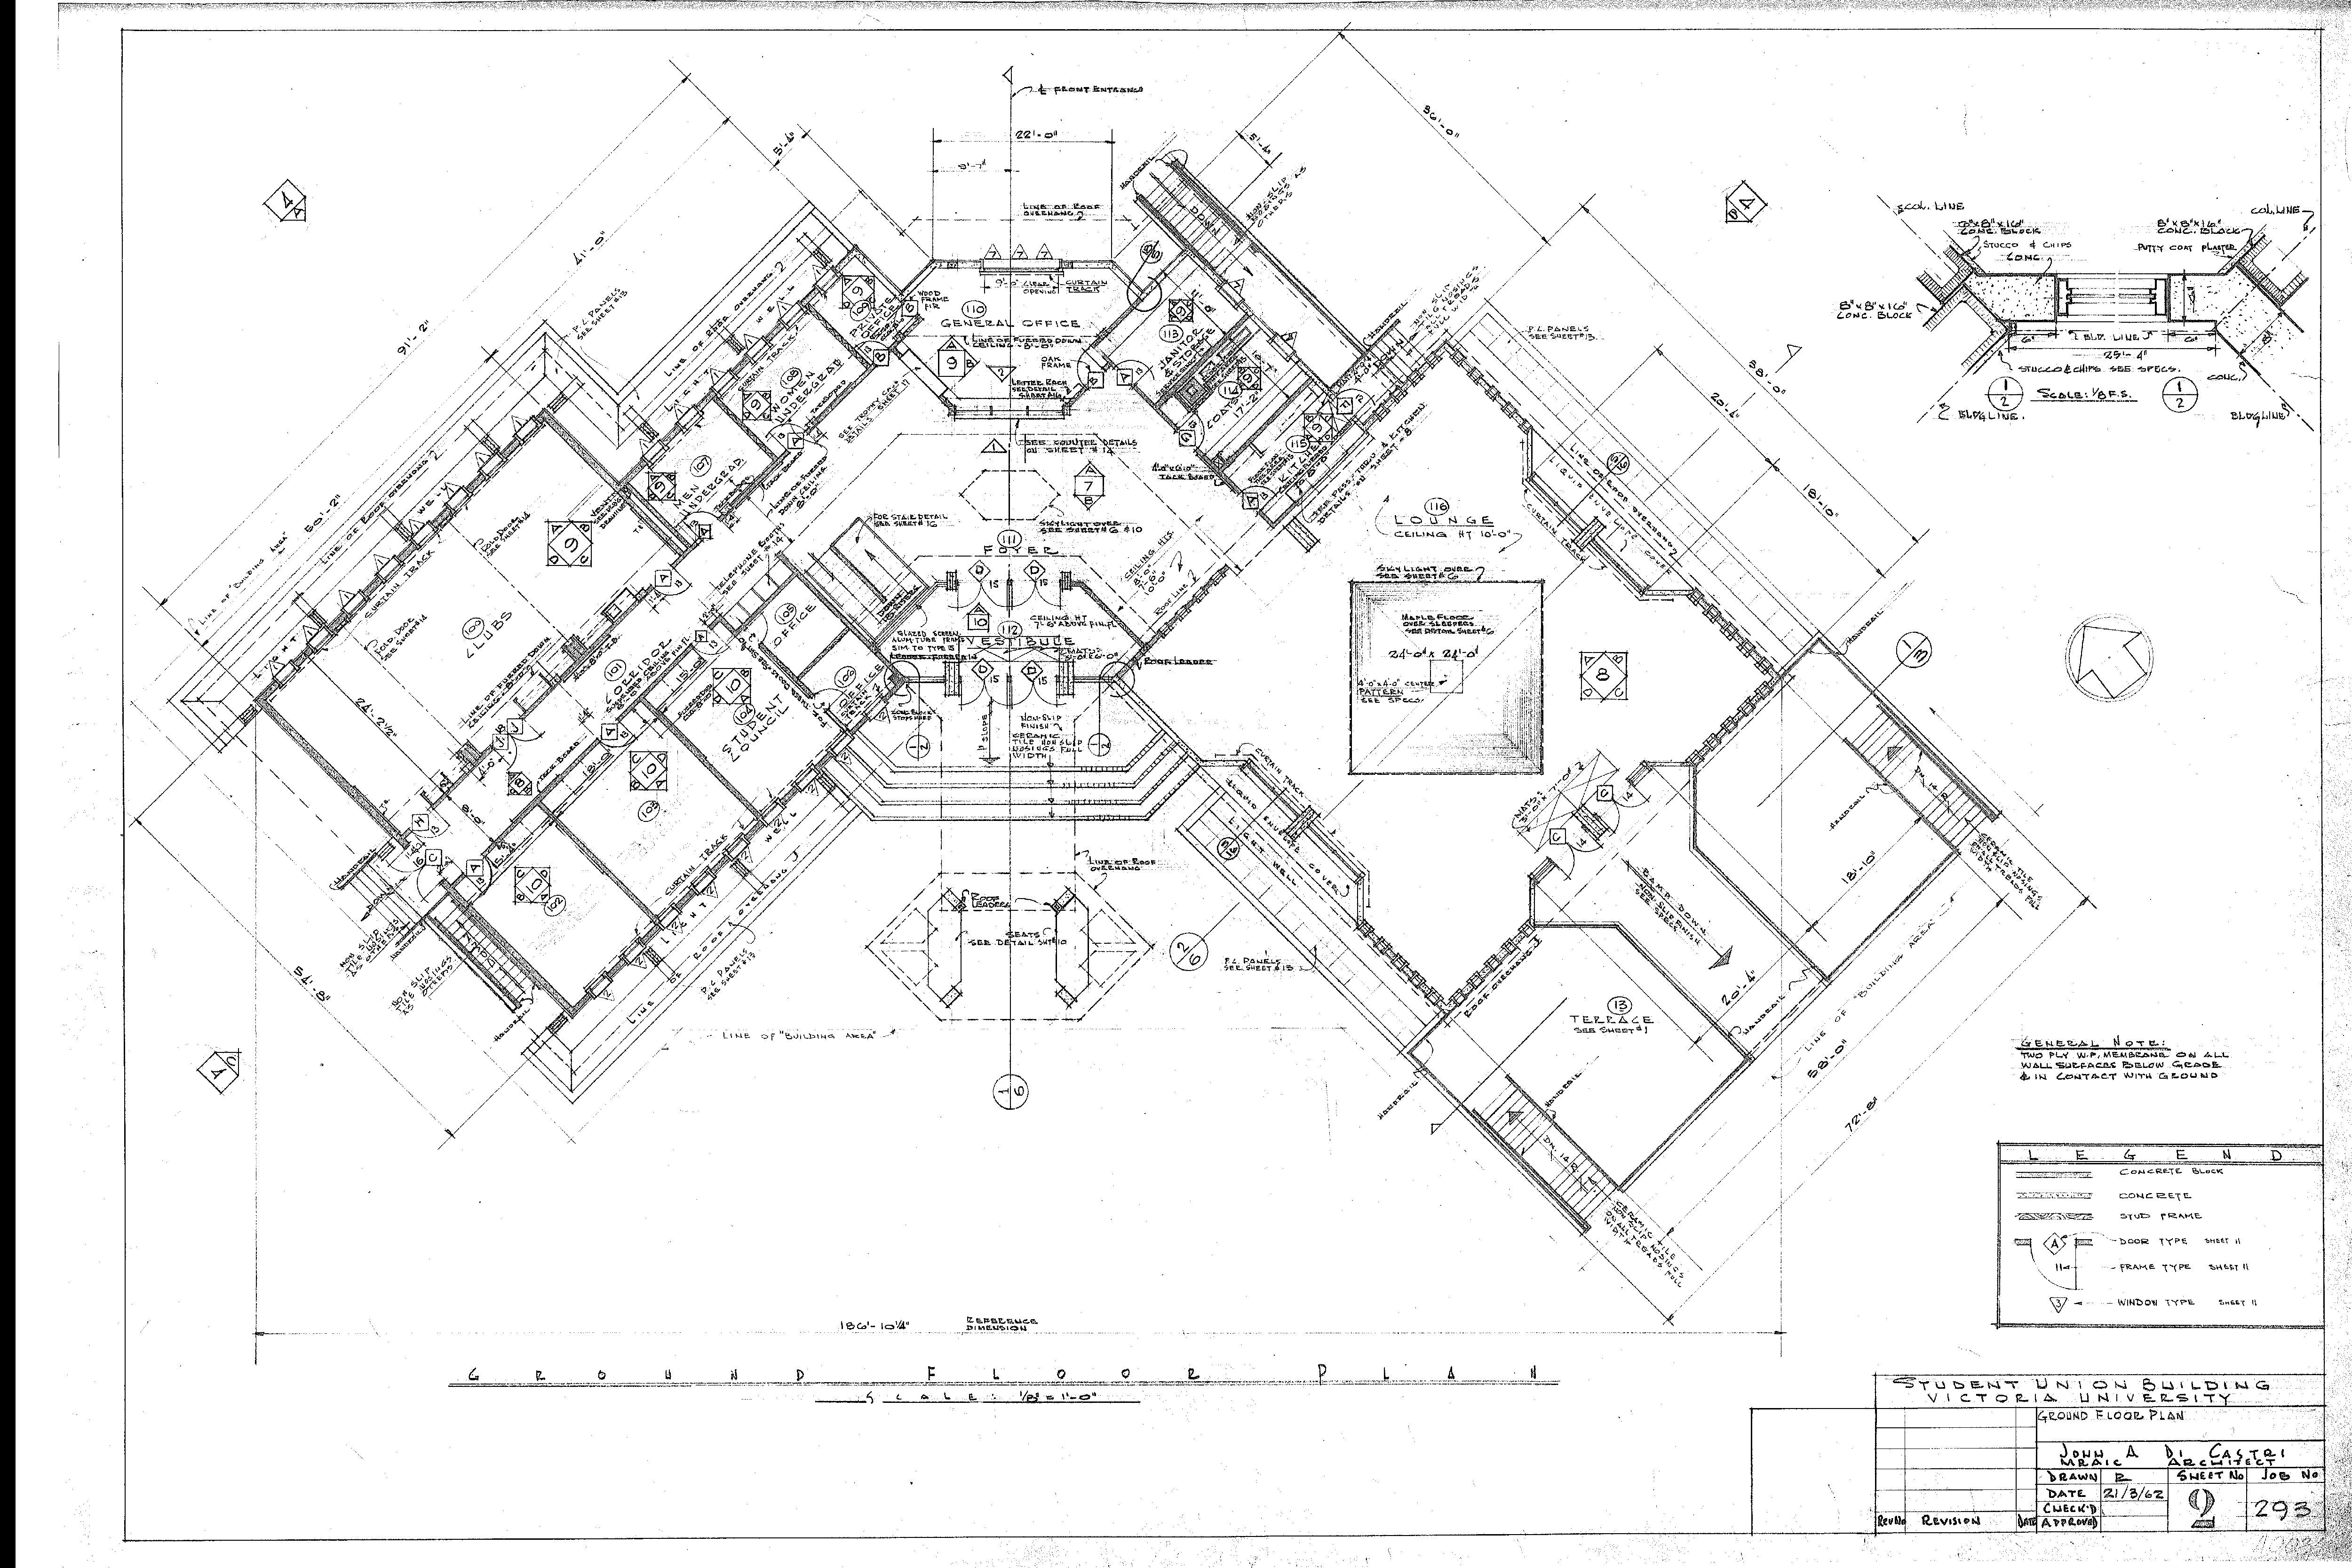 Interior Elevation Drawing Getdrawings Free Download